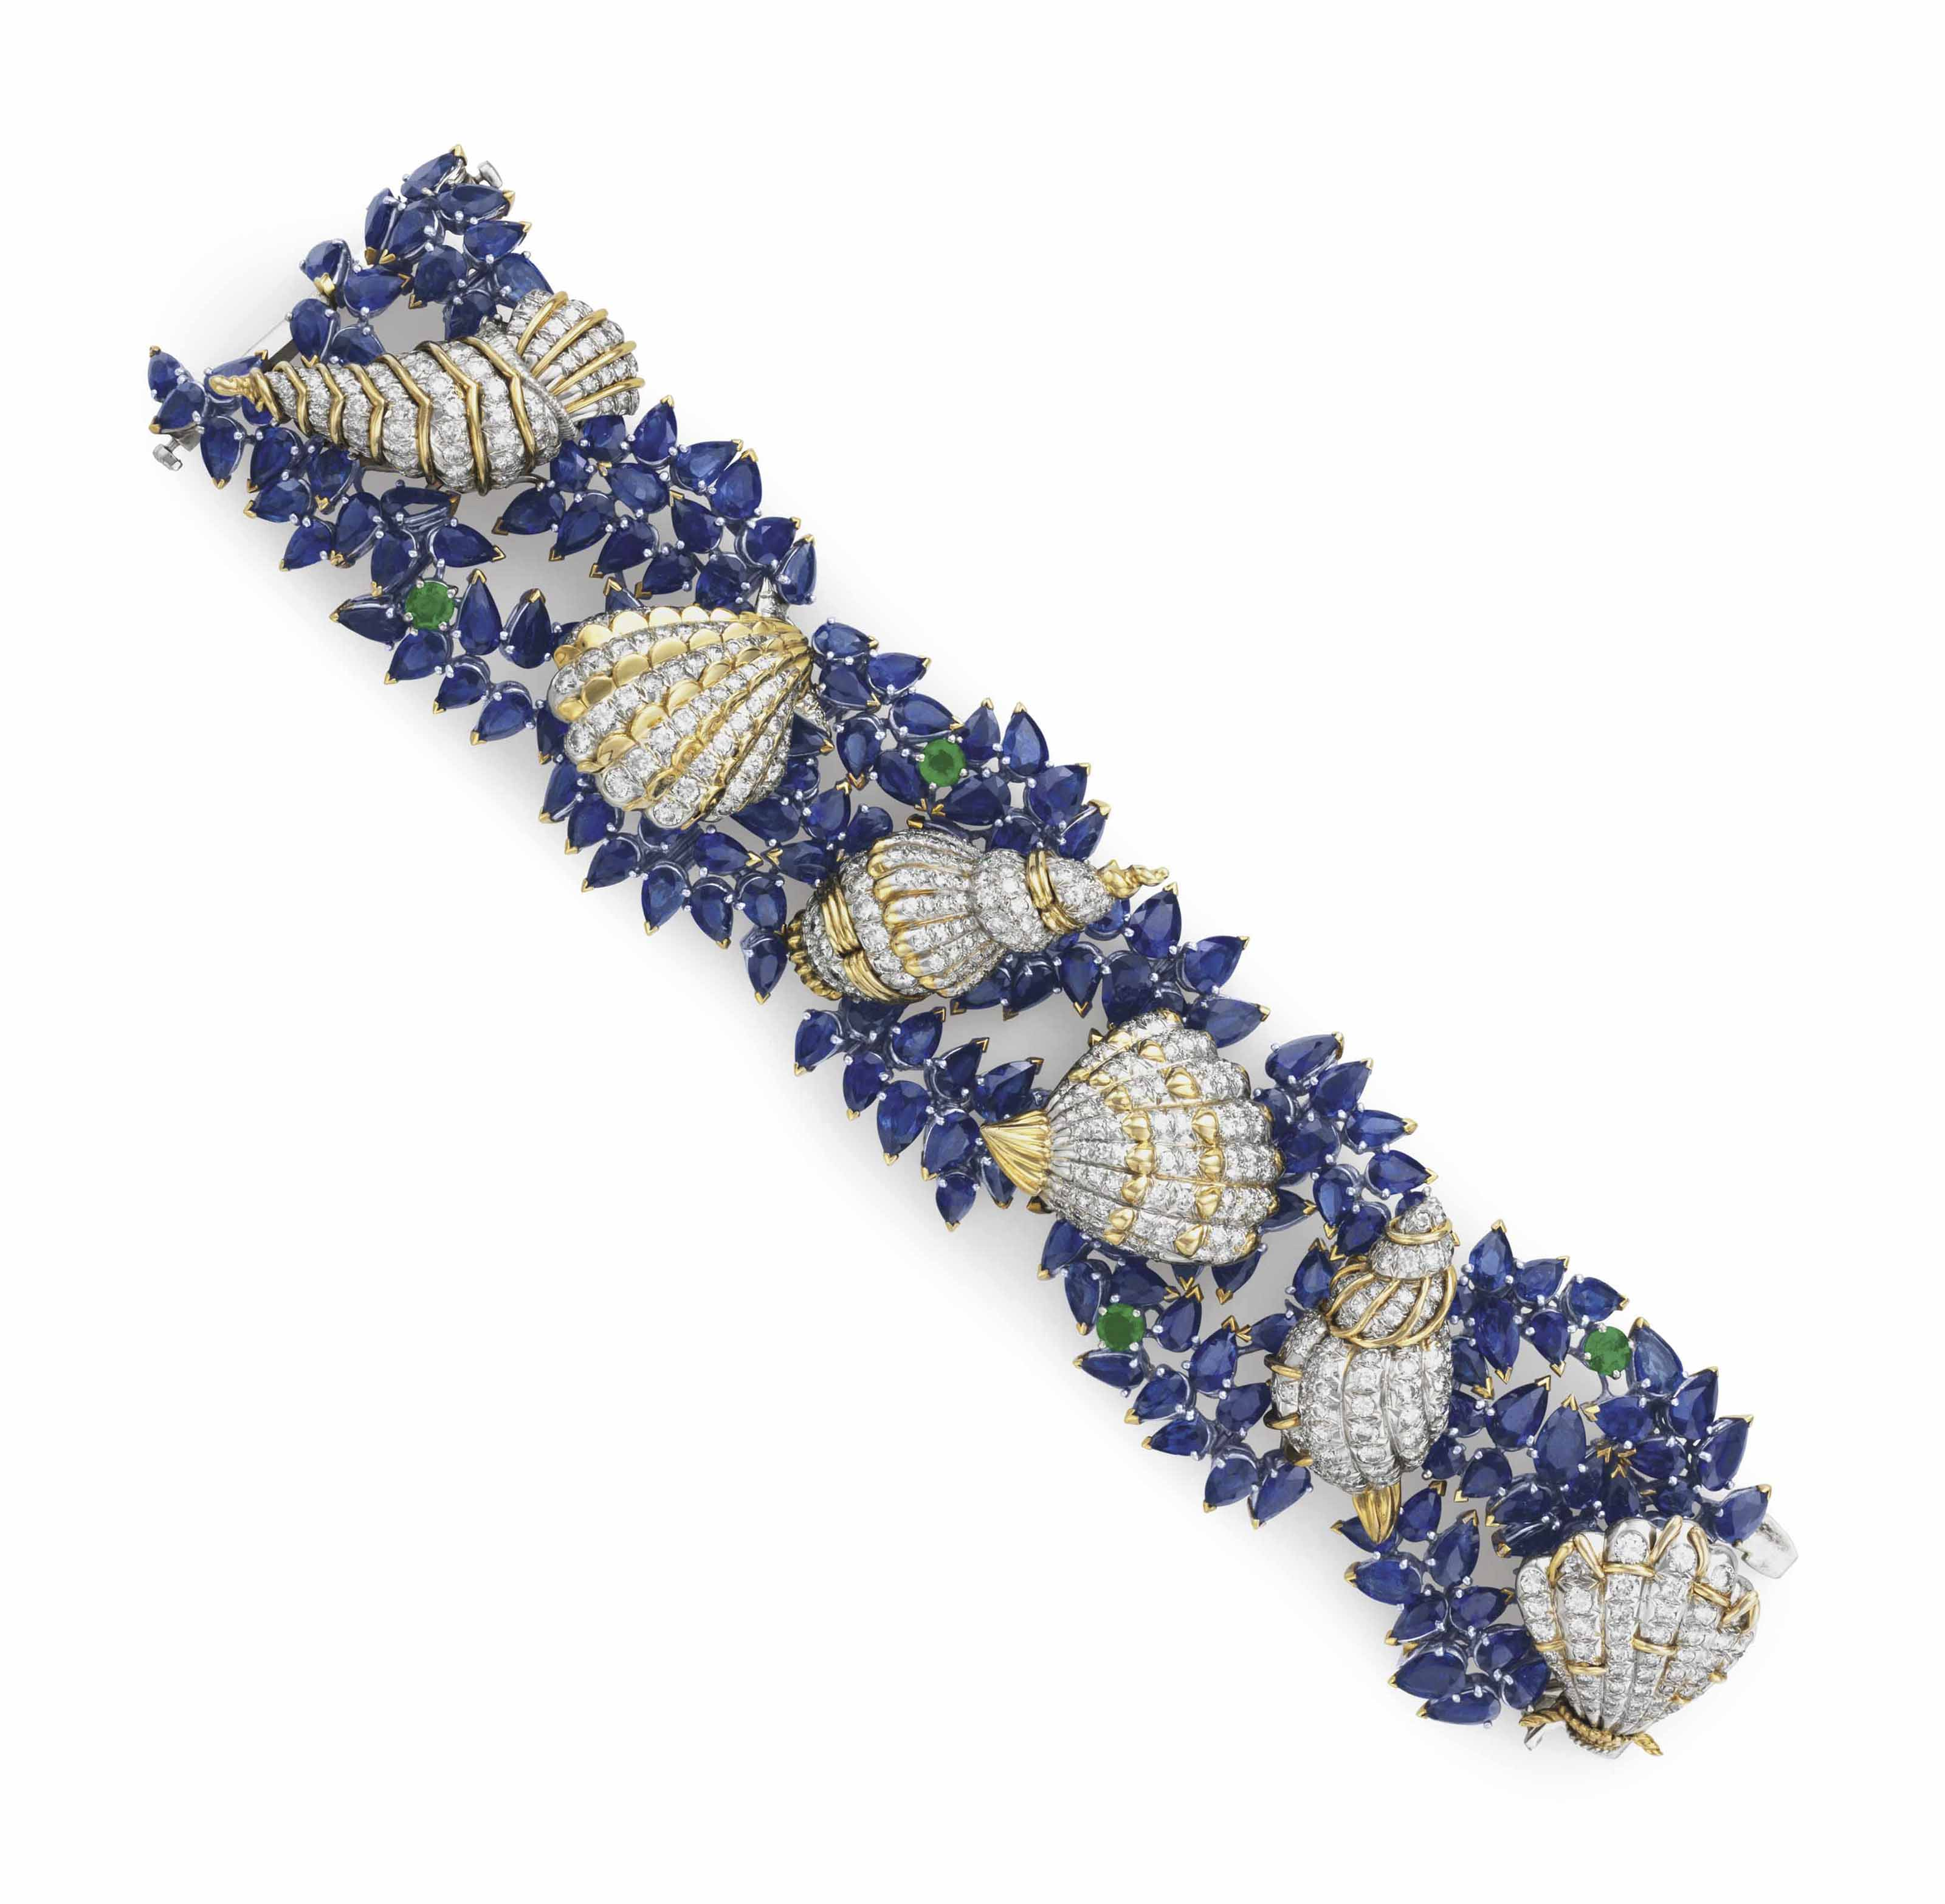 A SAPPHIRE, DIAMOND AND EMERALD 'SEA SHELLS' BRACELET, BY JEAN SCHLUMBERGER, TIFFANY & CO.